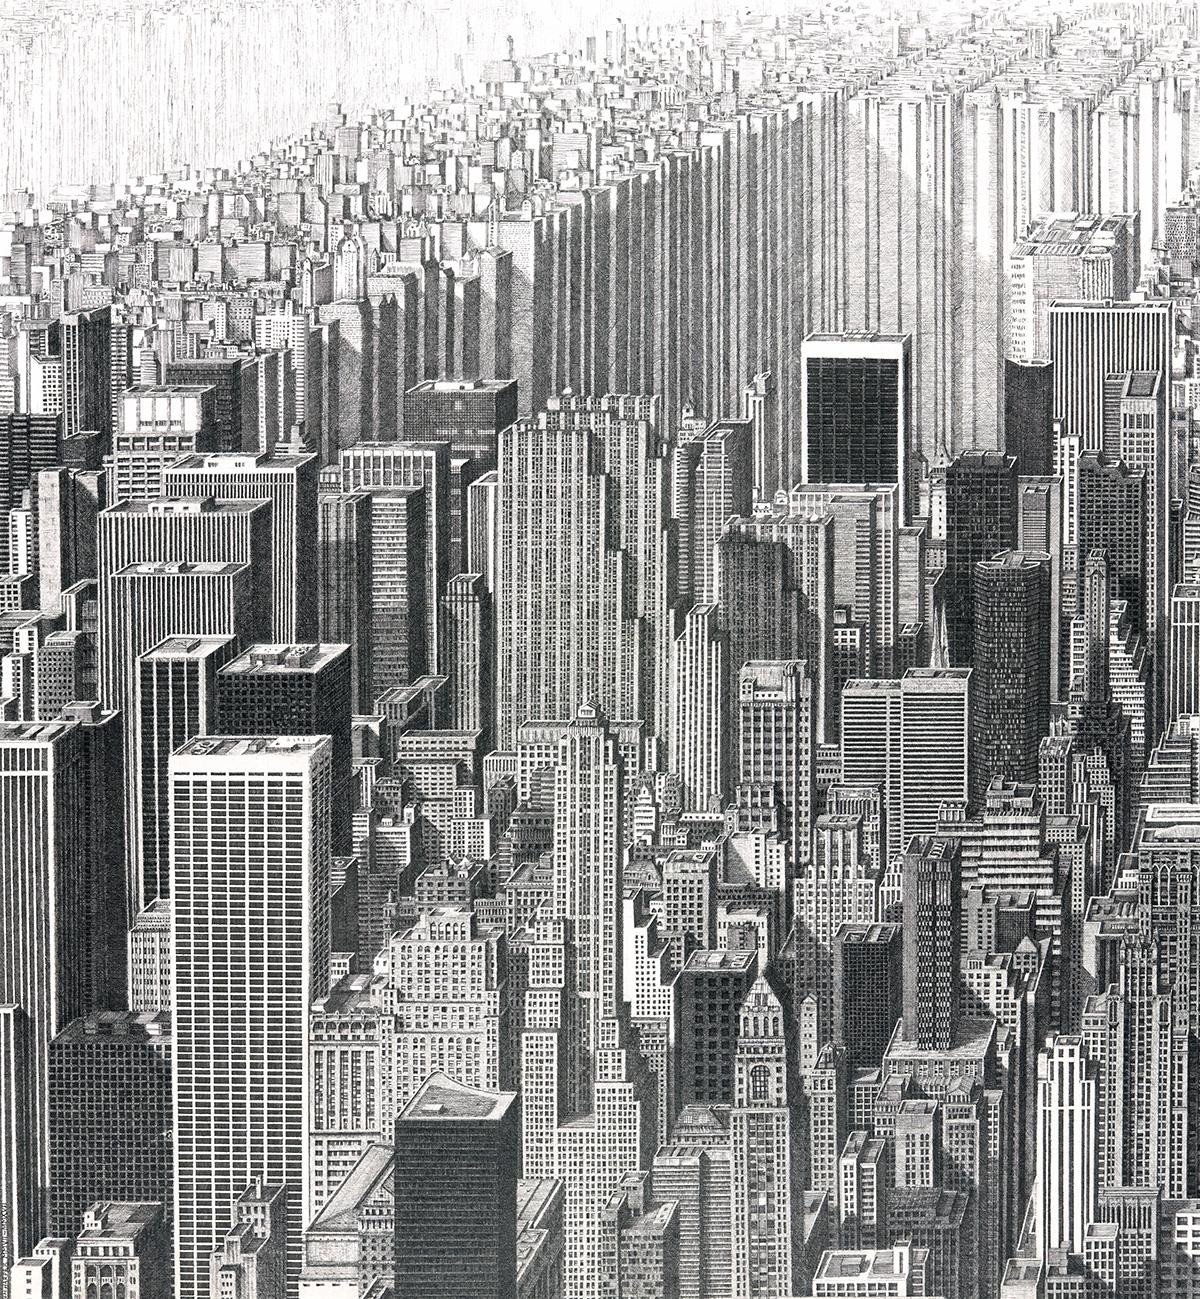 City G (New York)